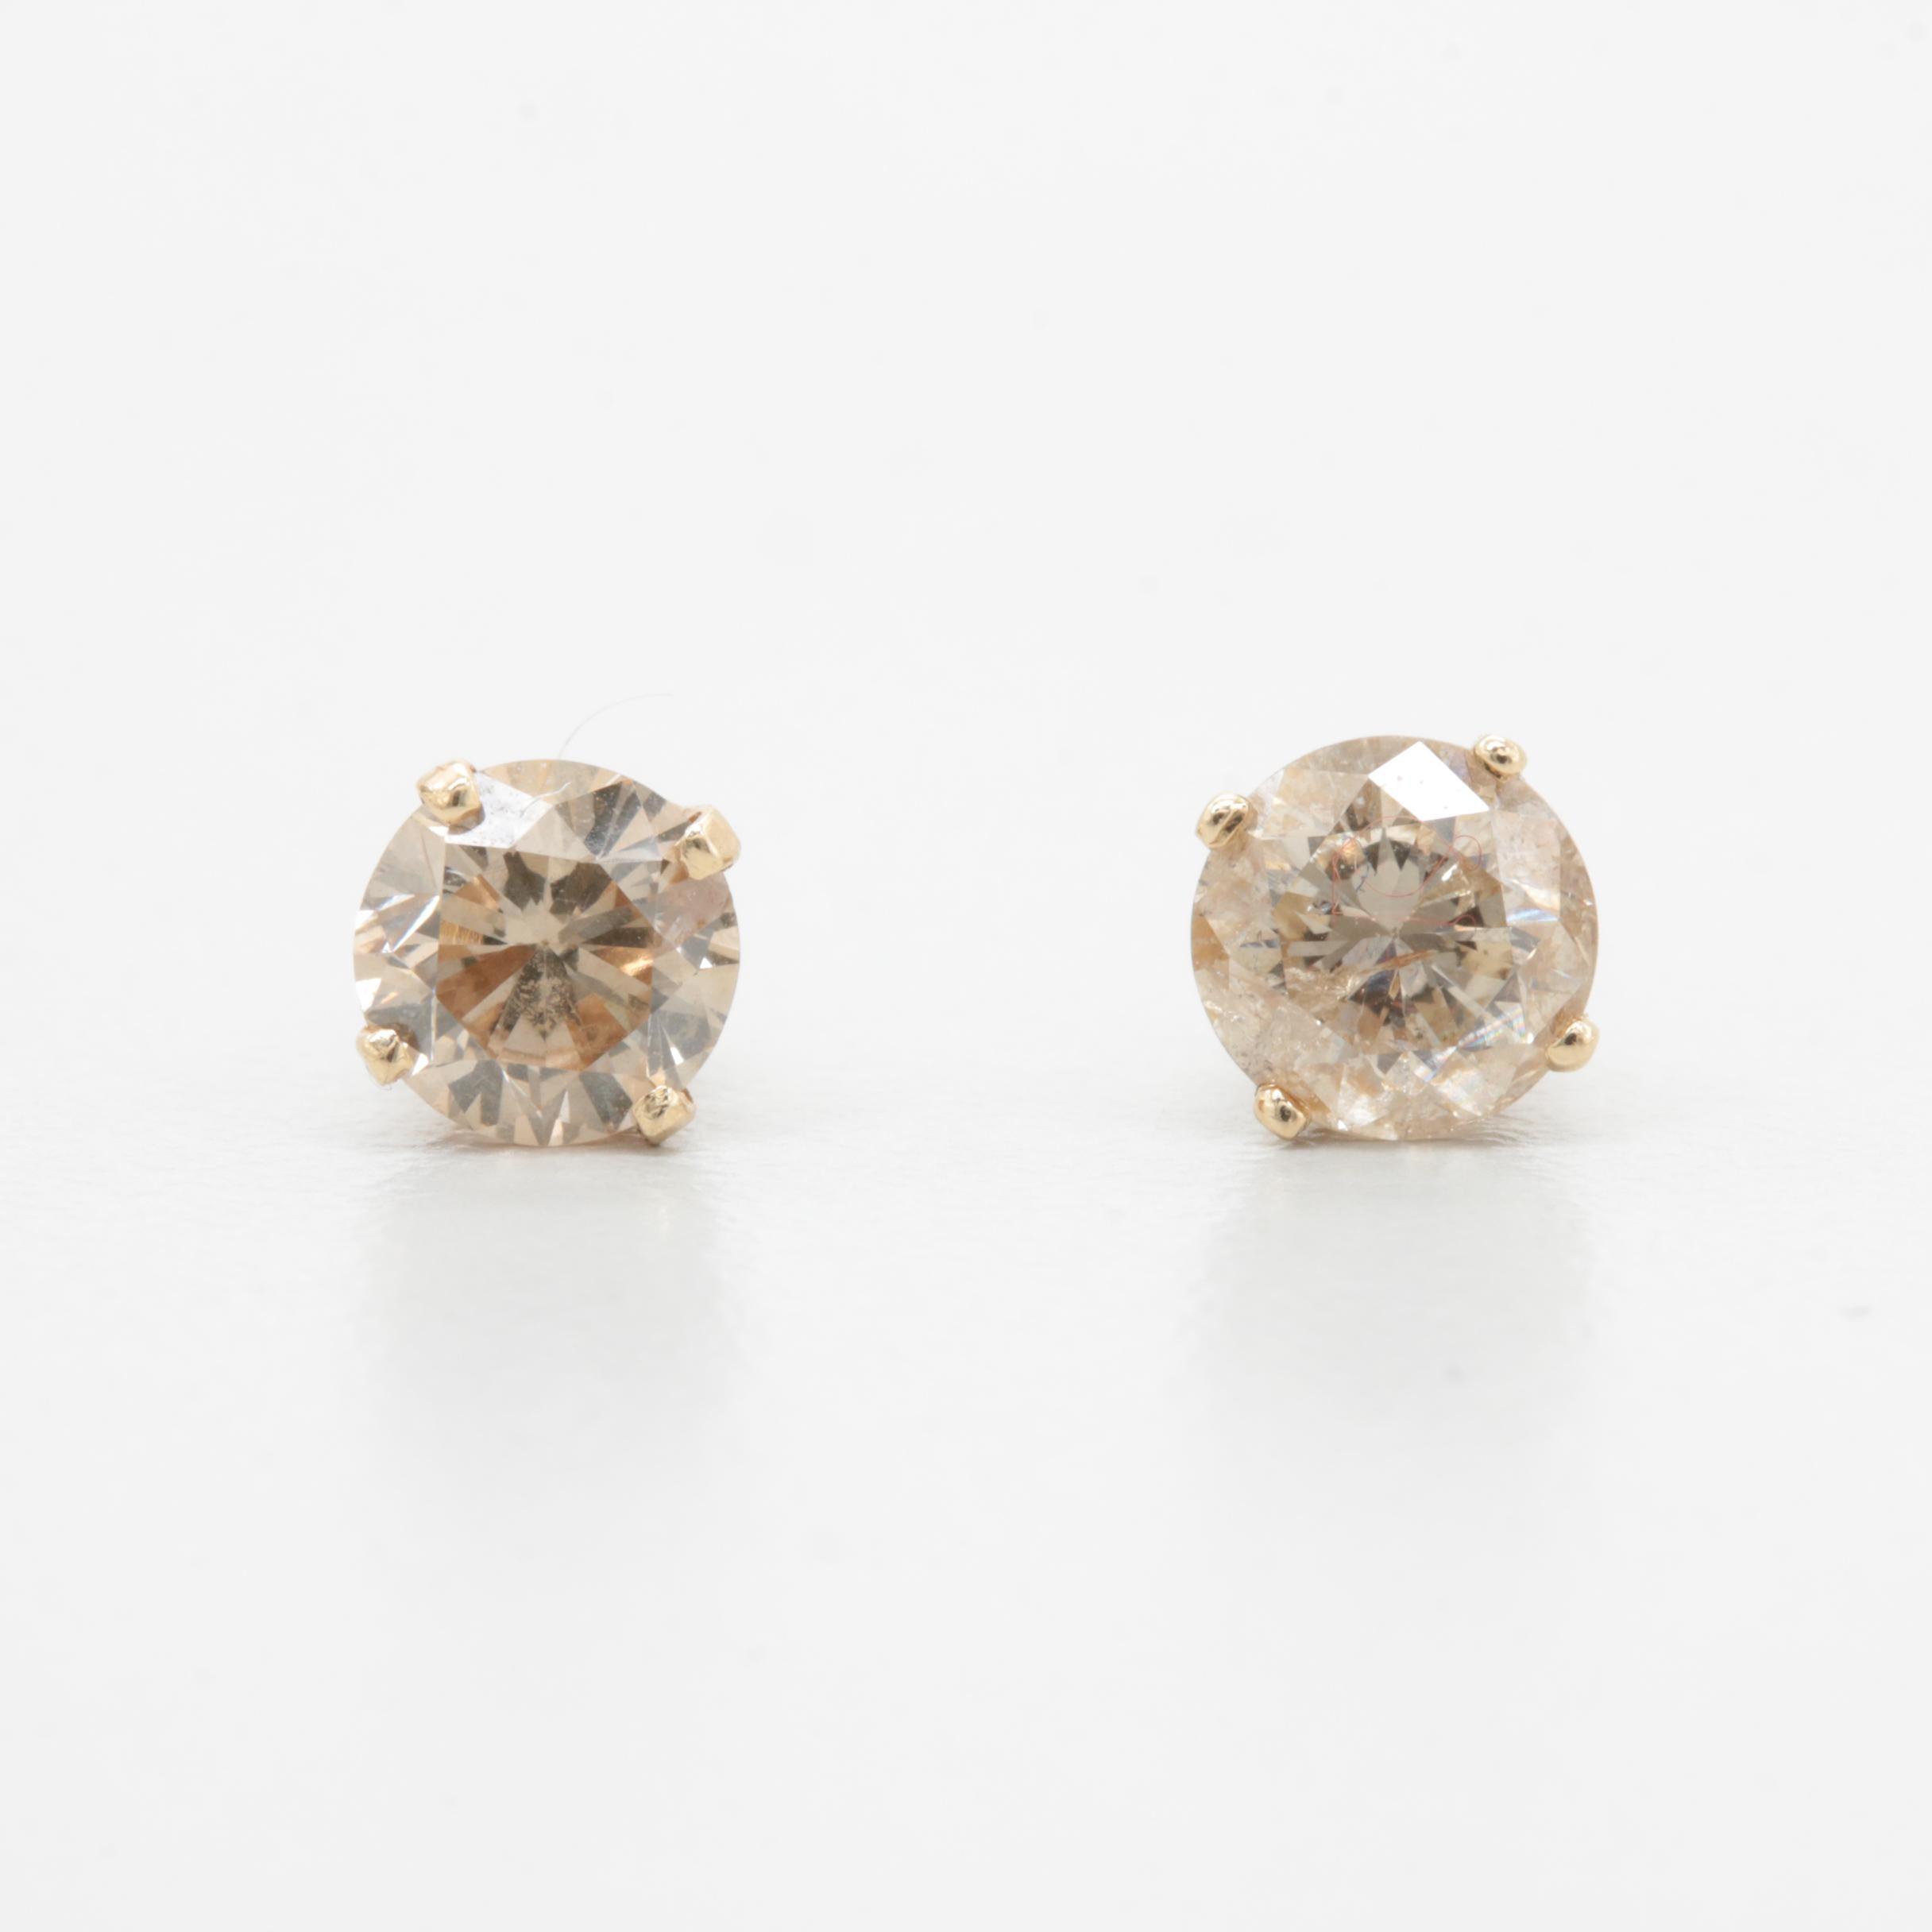 14K Yellow Gold 1.00 CTW Diamond Stud Earrings